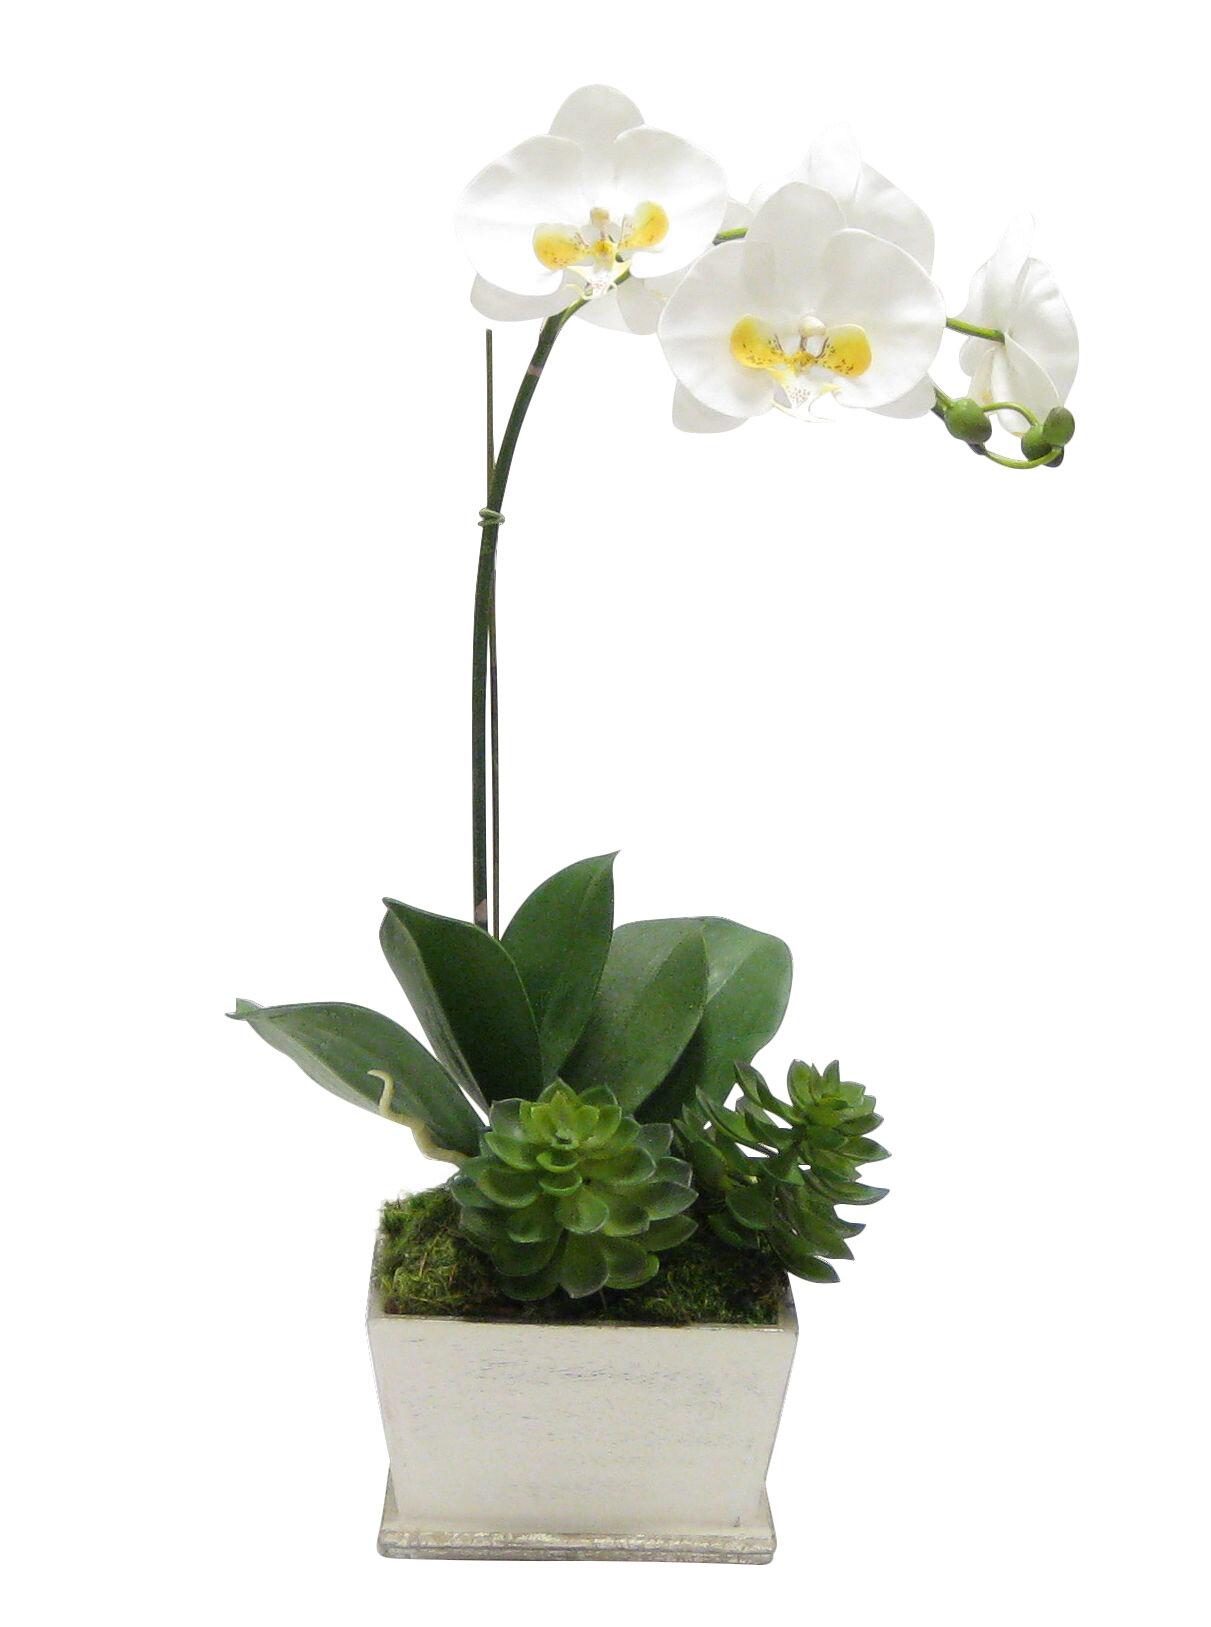 Bougainvillea Phalaenopsis Orchid Floral Arrangement In Planter Reviews Perigold